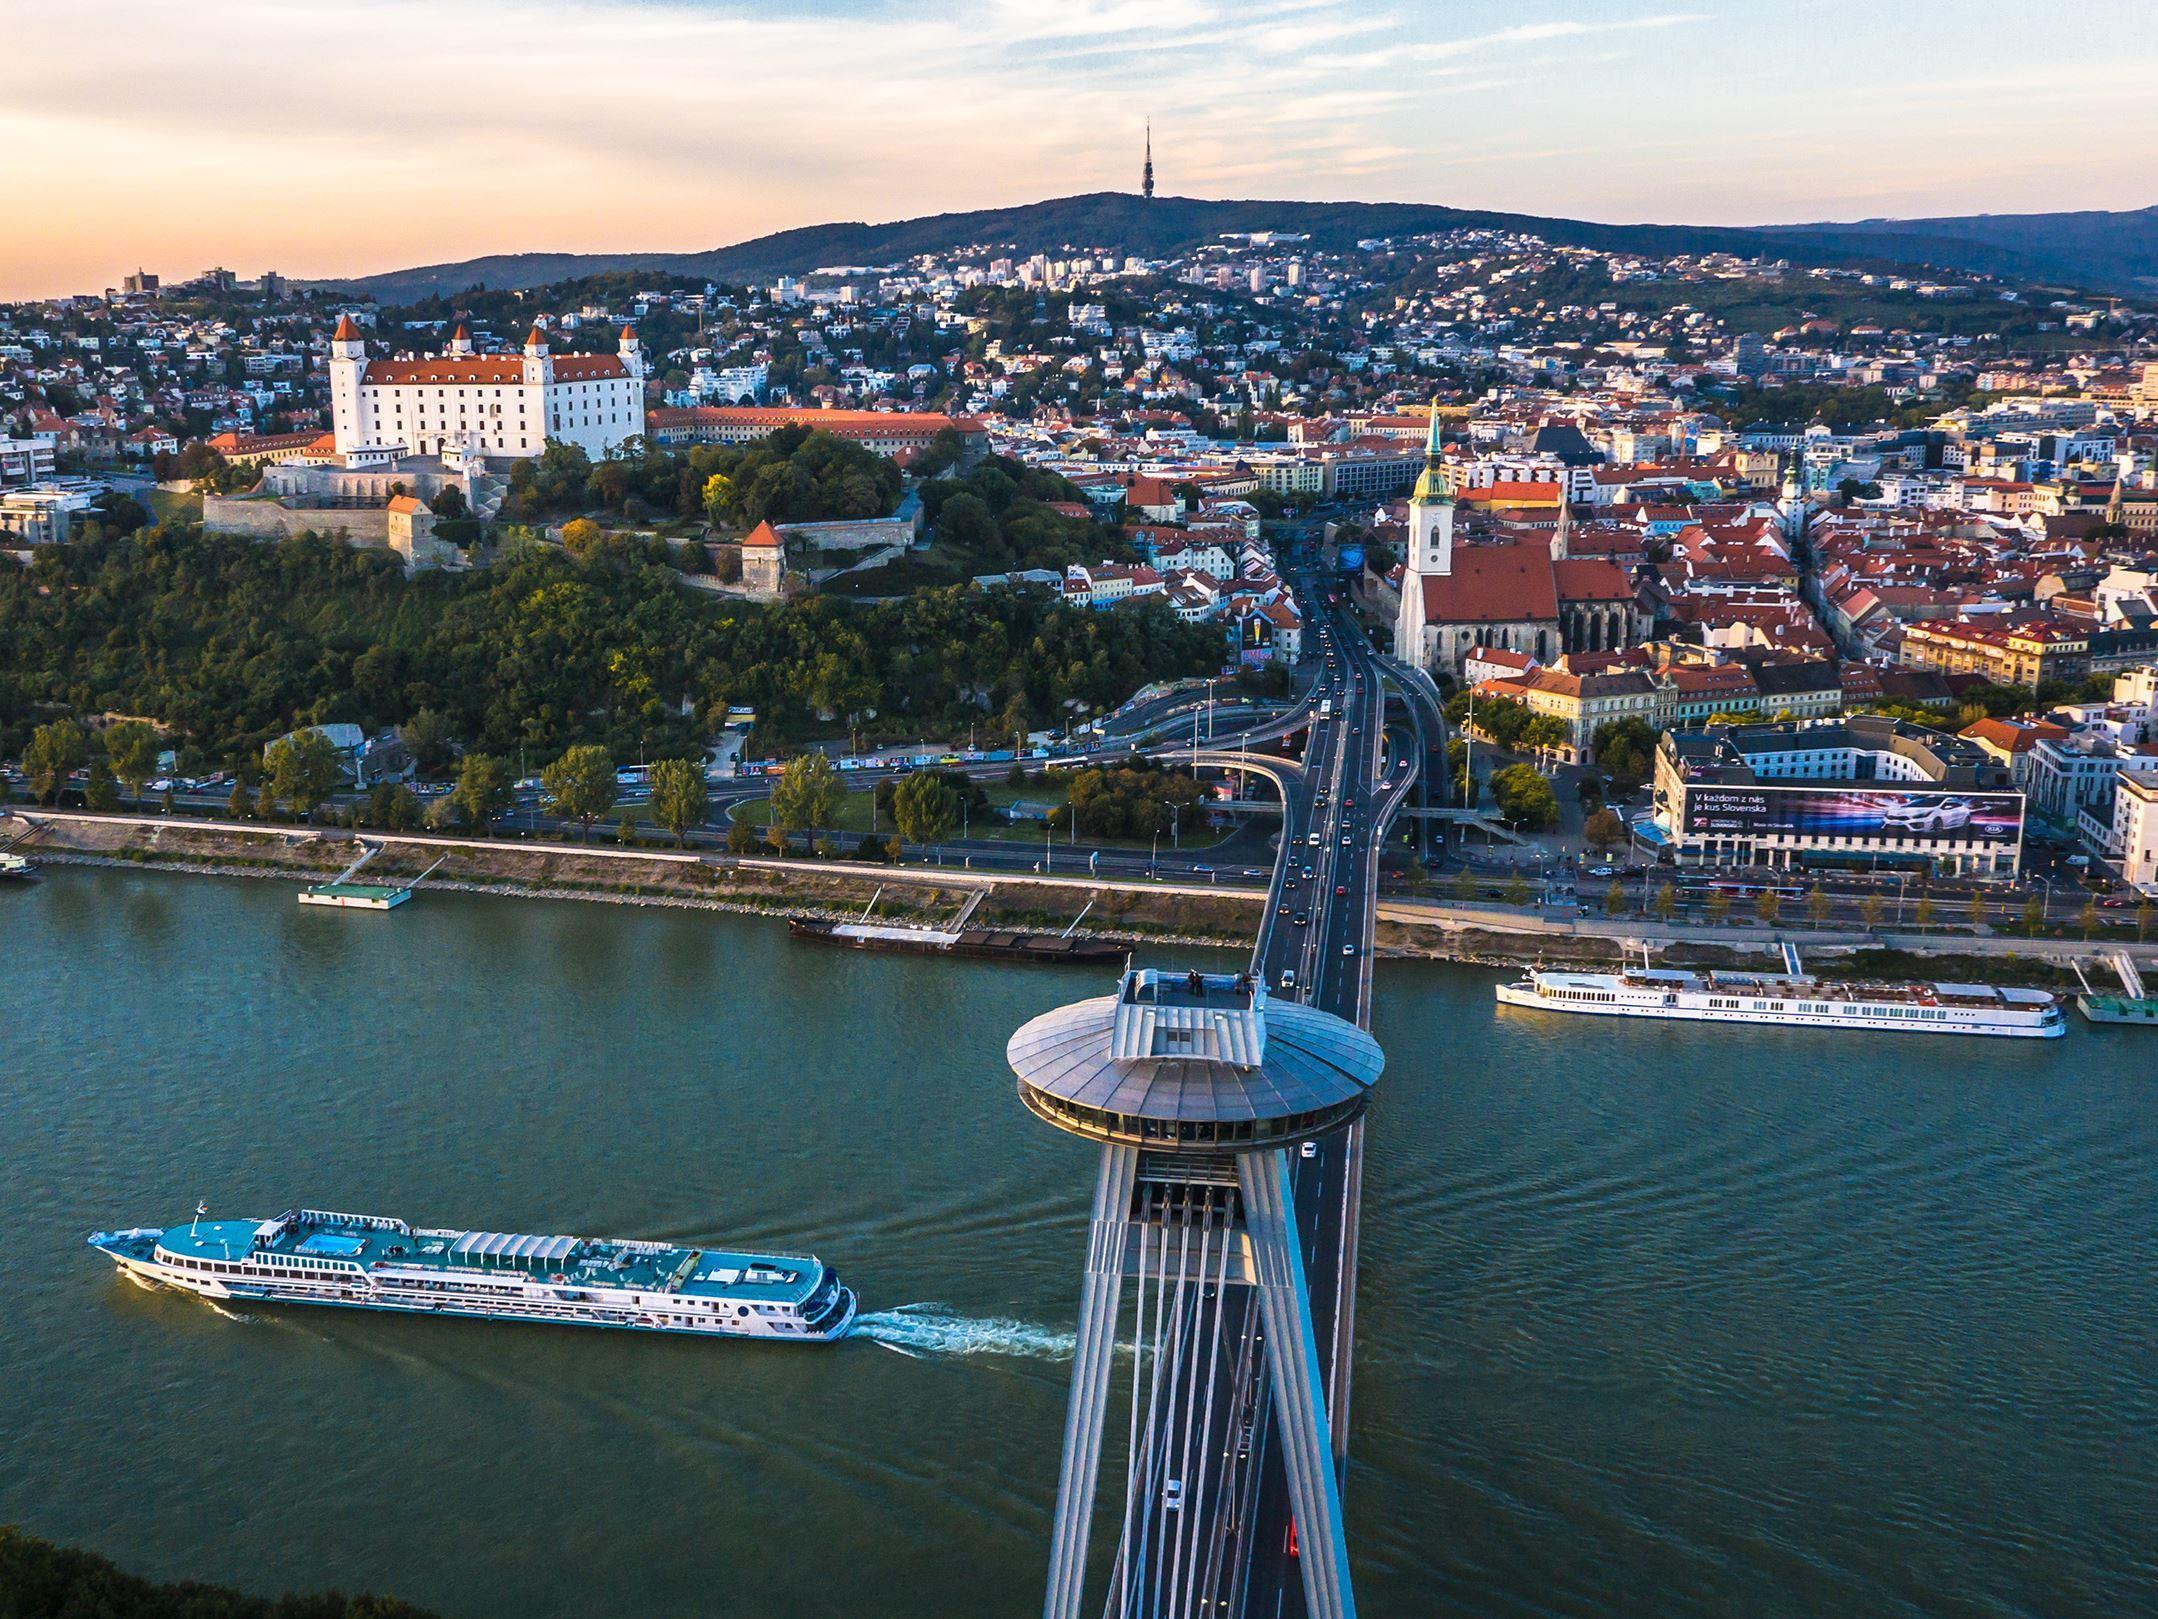 Baştan Başa Orta Avrupa 5 & 12 & 19 & 26 Temmuz 2020